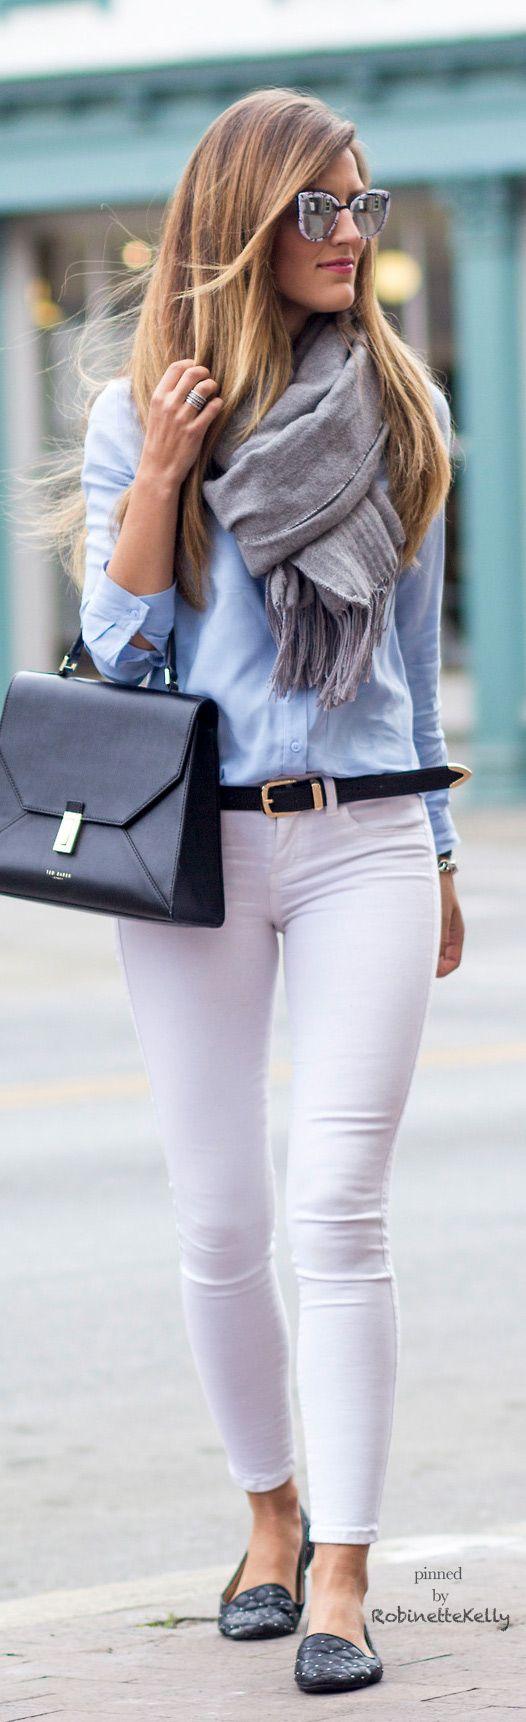 Outfits Pants BlancosAtuendo StyleWhite Y Pantalones Street 3LjA54R